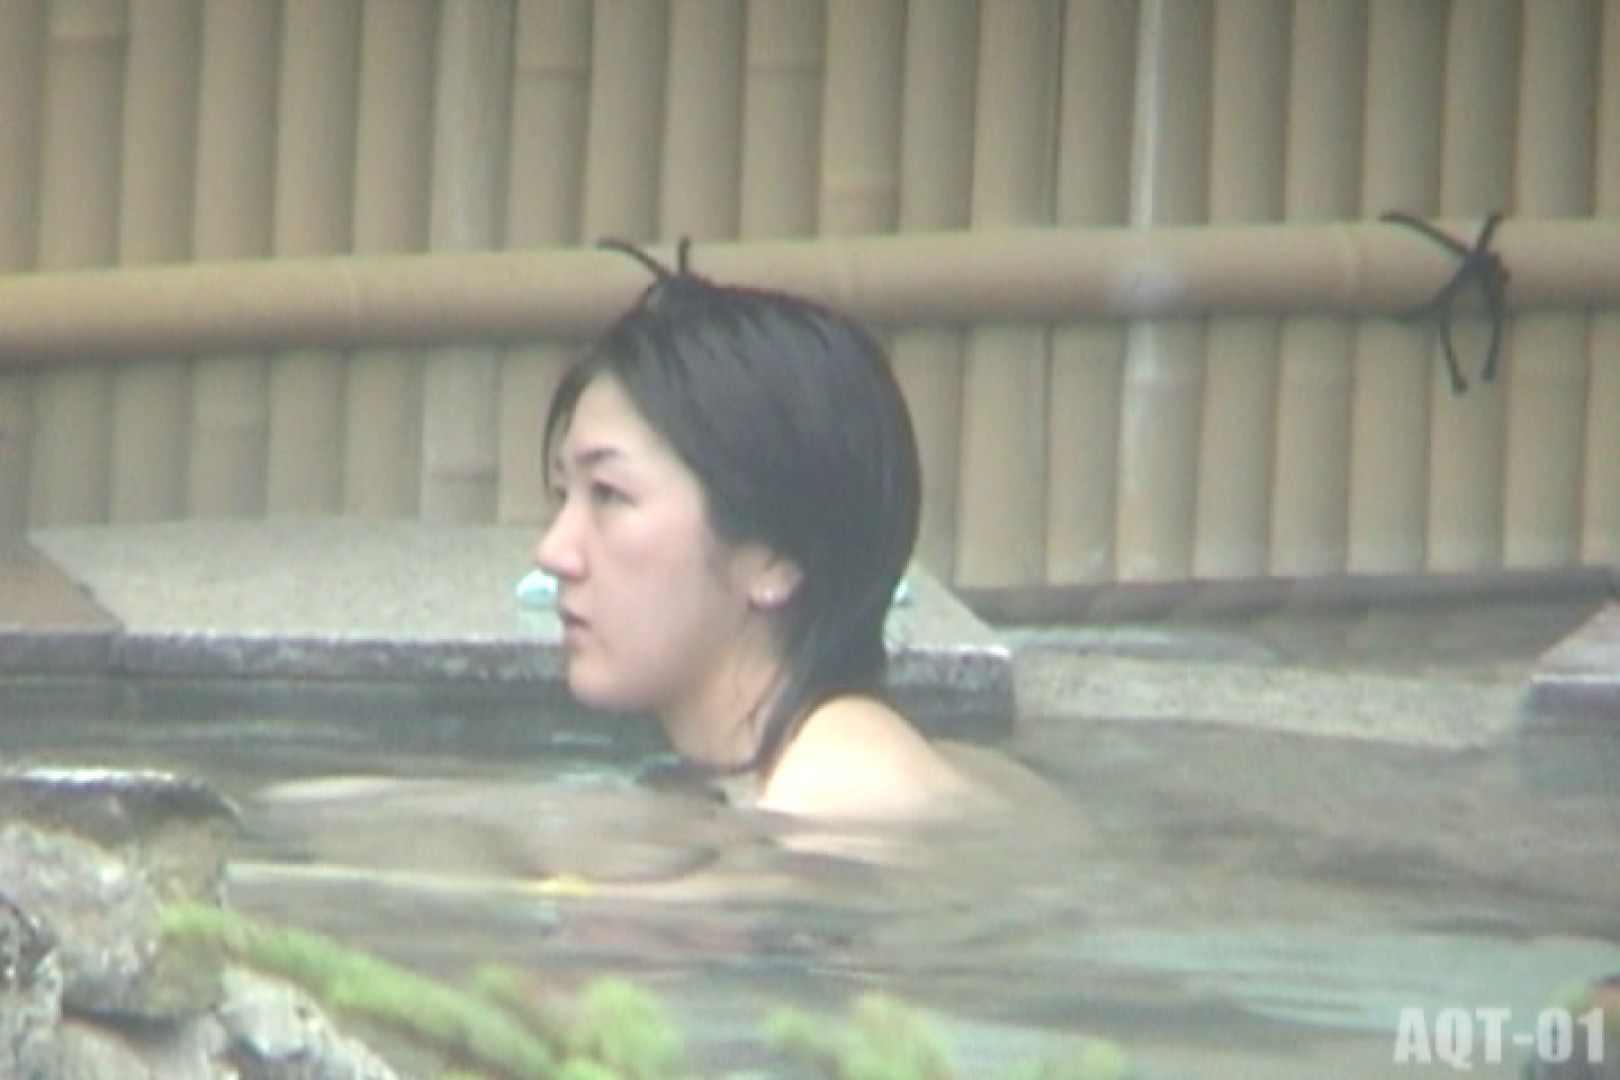 Aquaな露天風呂Vol.715 盗撮シリーズ   露天風呂編  108PIX 49